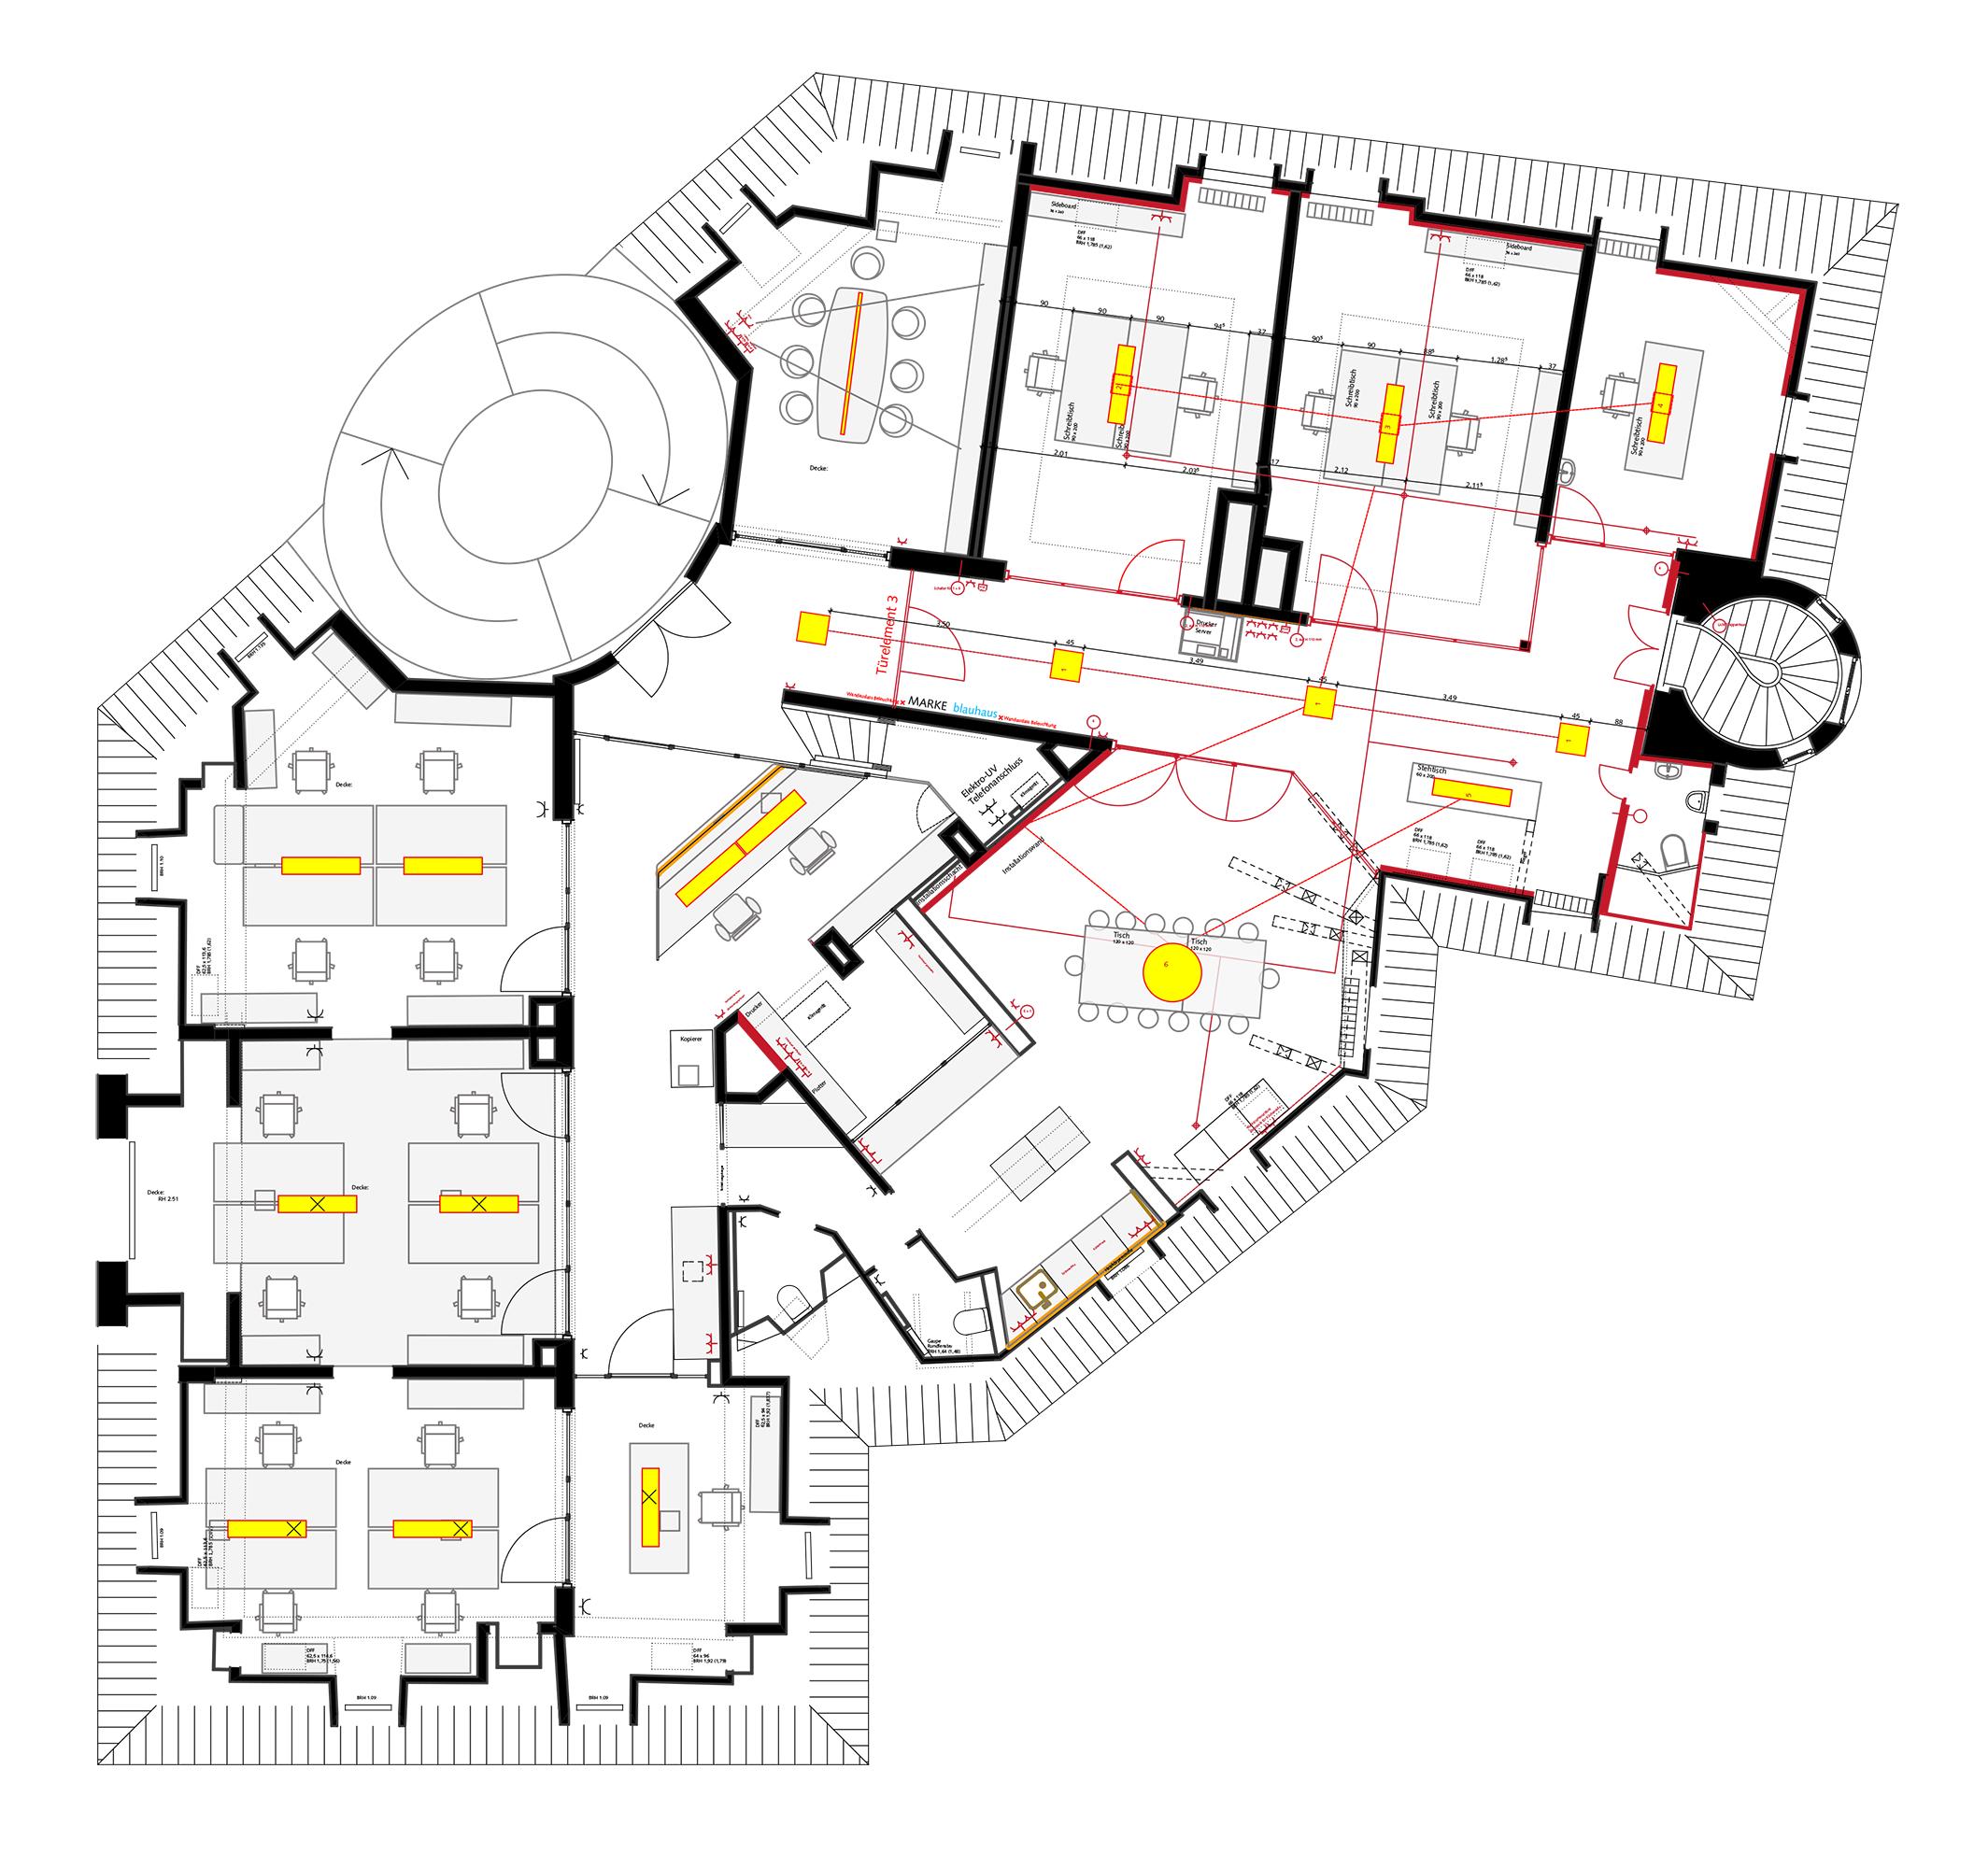 blauhaus b ro blauhaus architekten. Black Bedroom Furniture Sets. Home Design Ideas